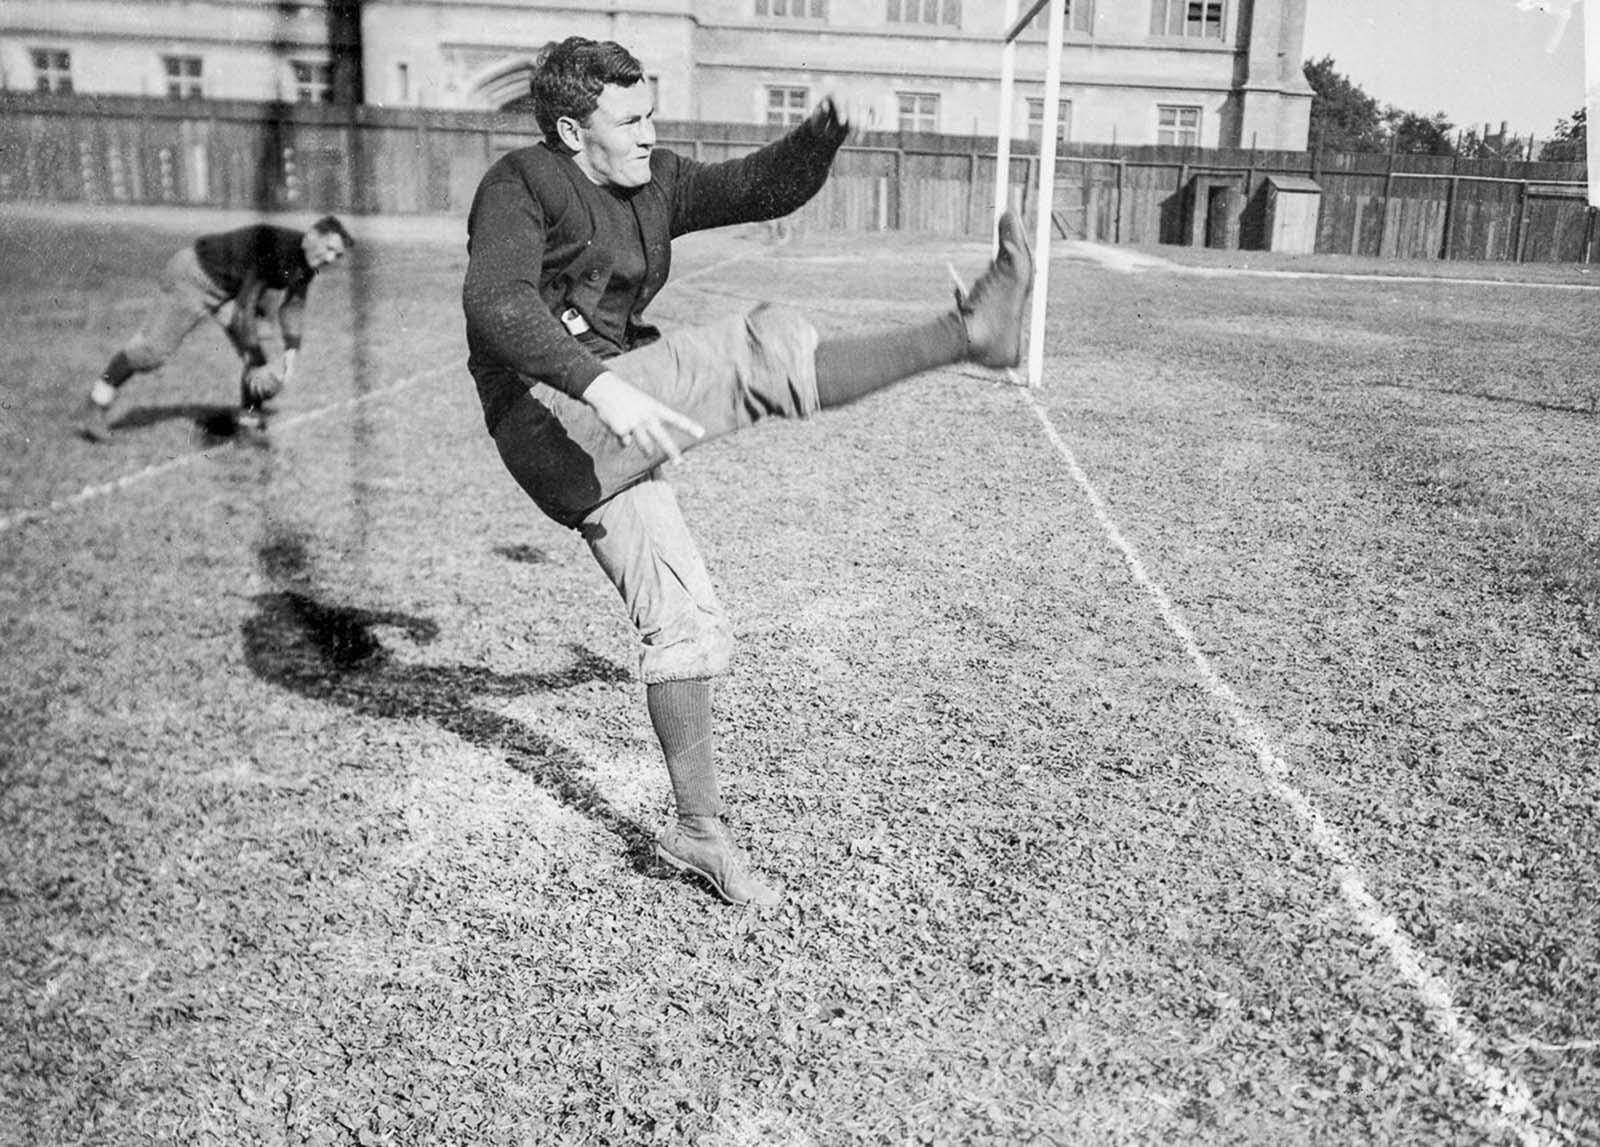 University of Chicago football player Orville